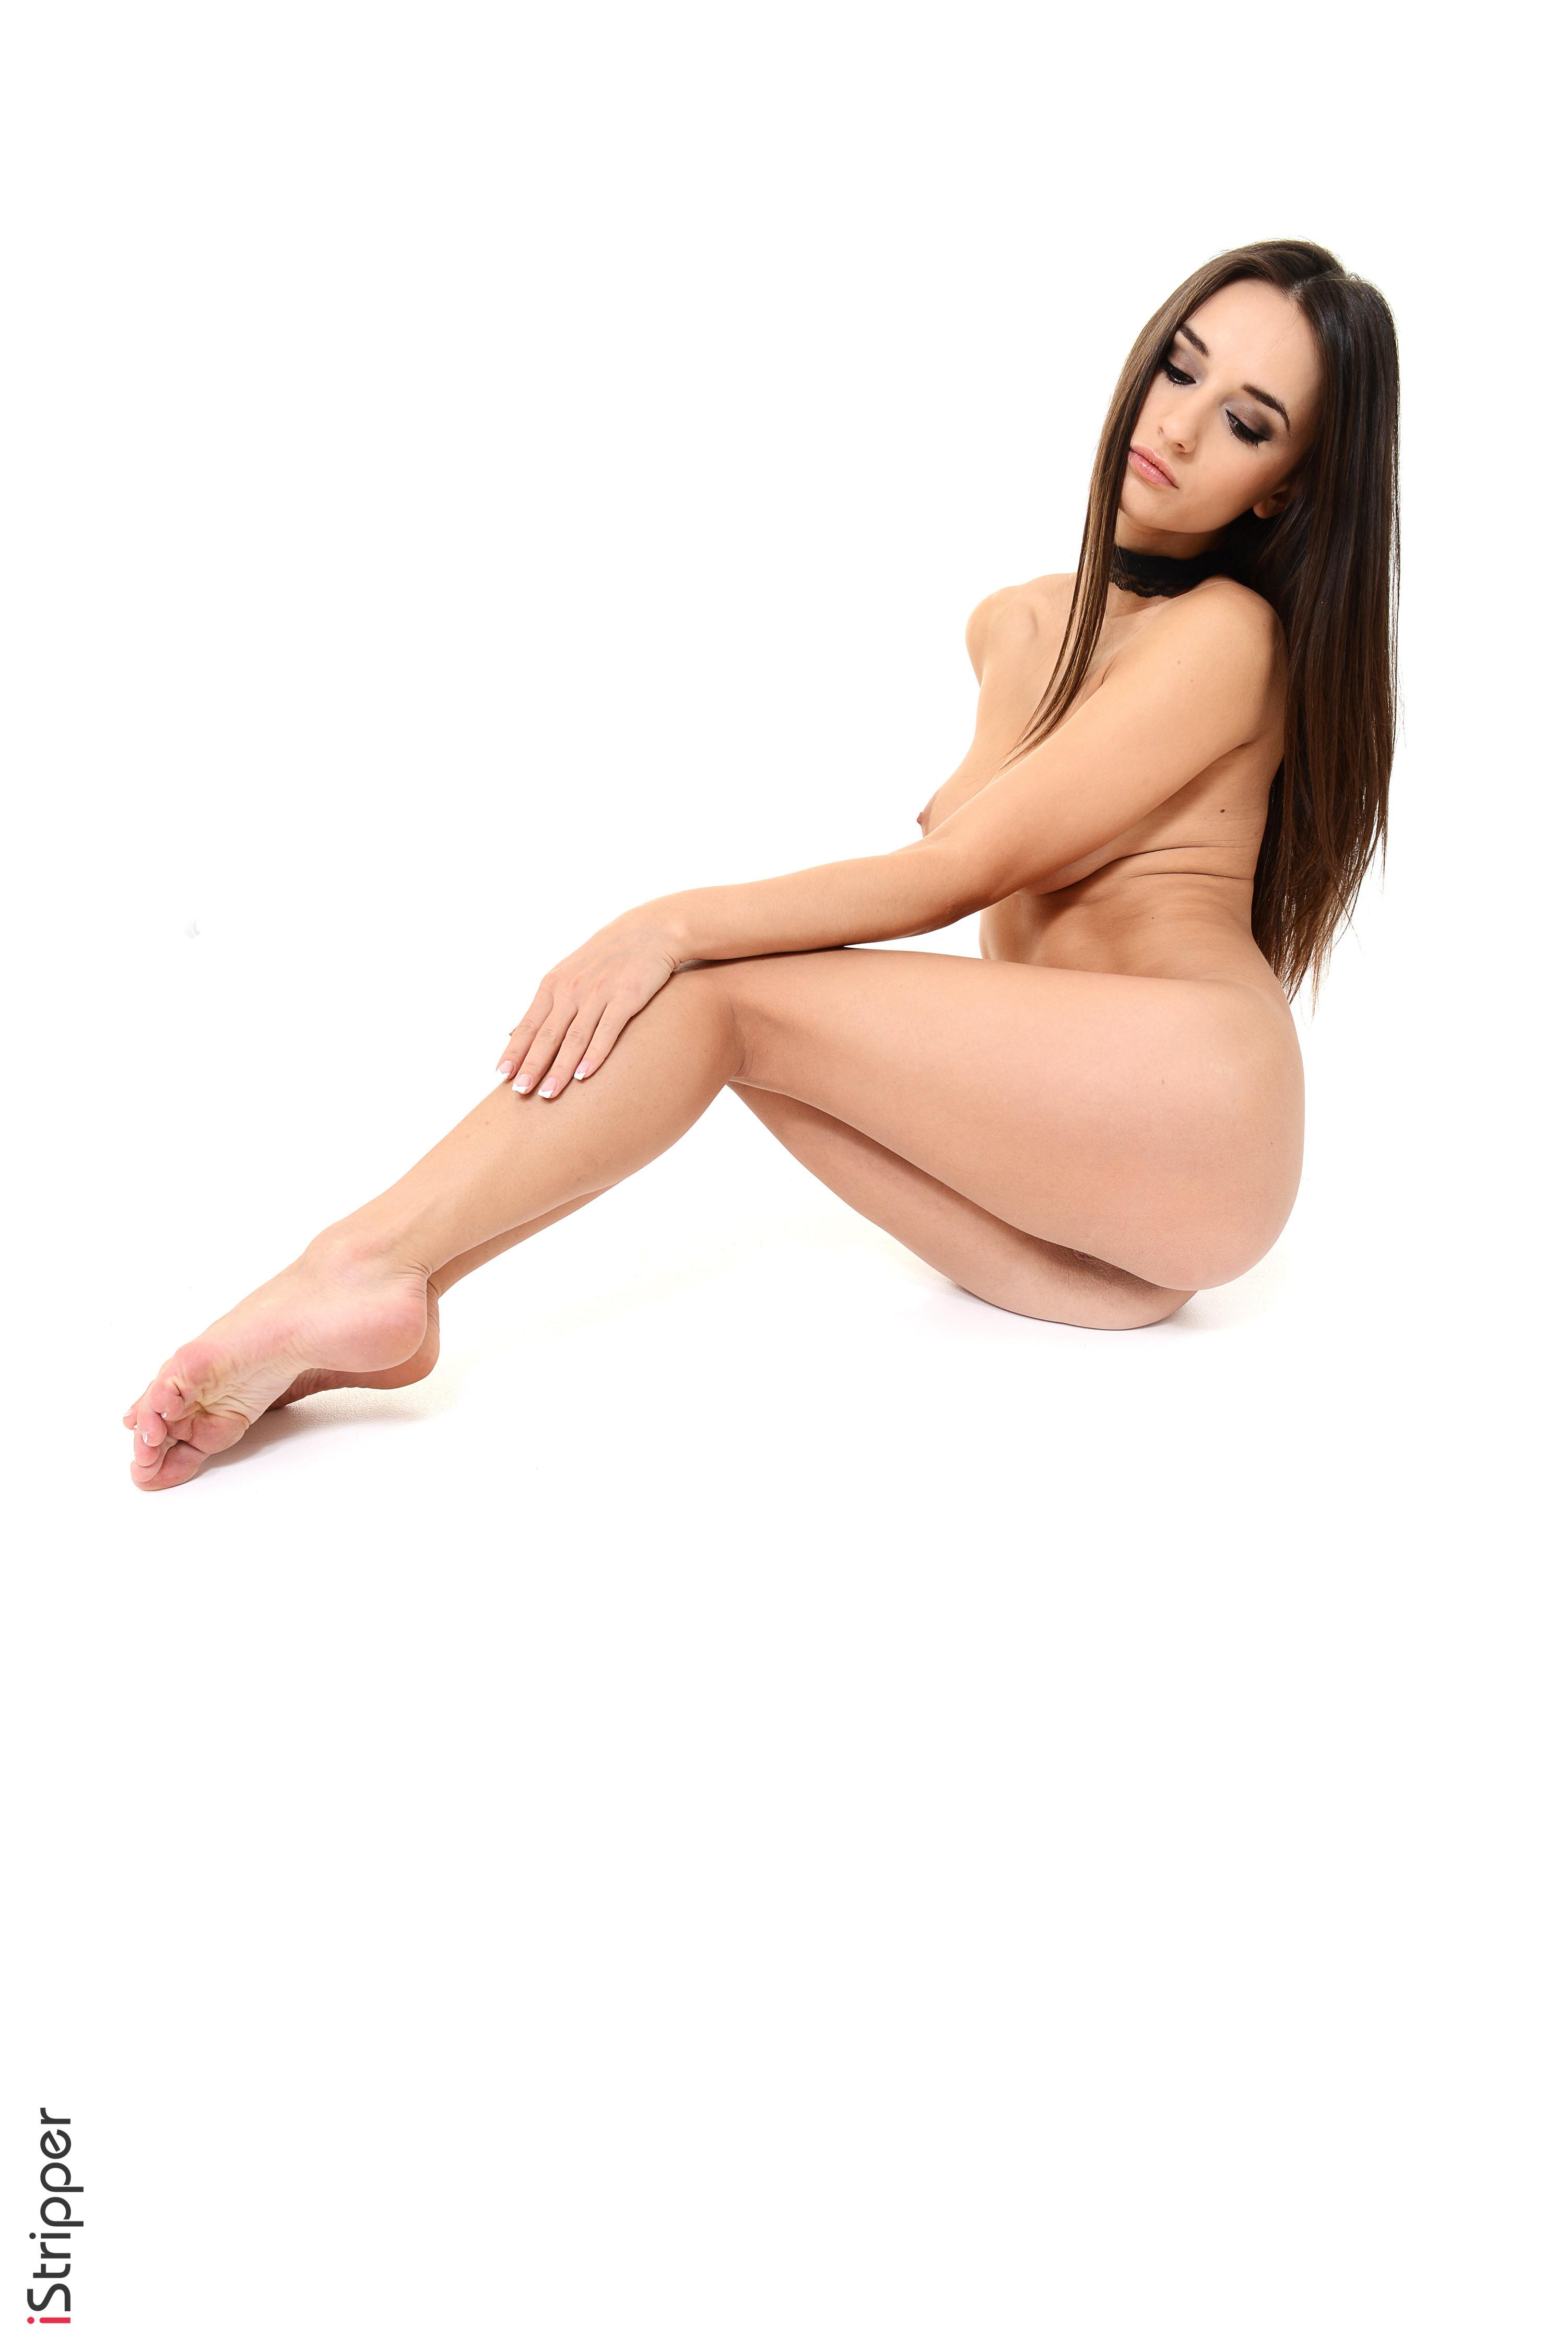 girls slowly stripping down